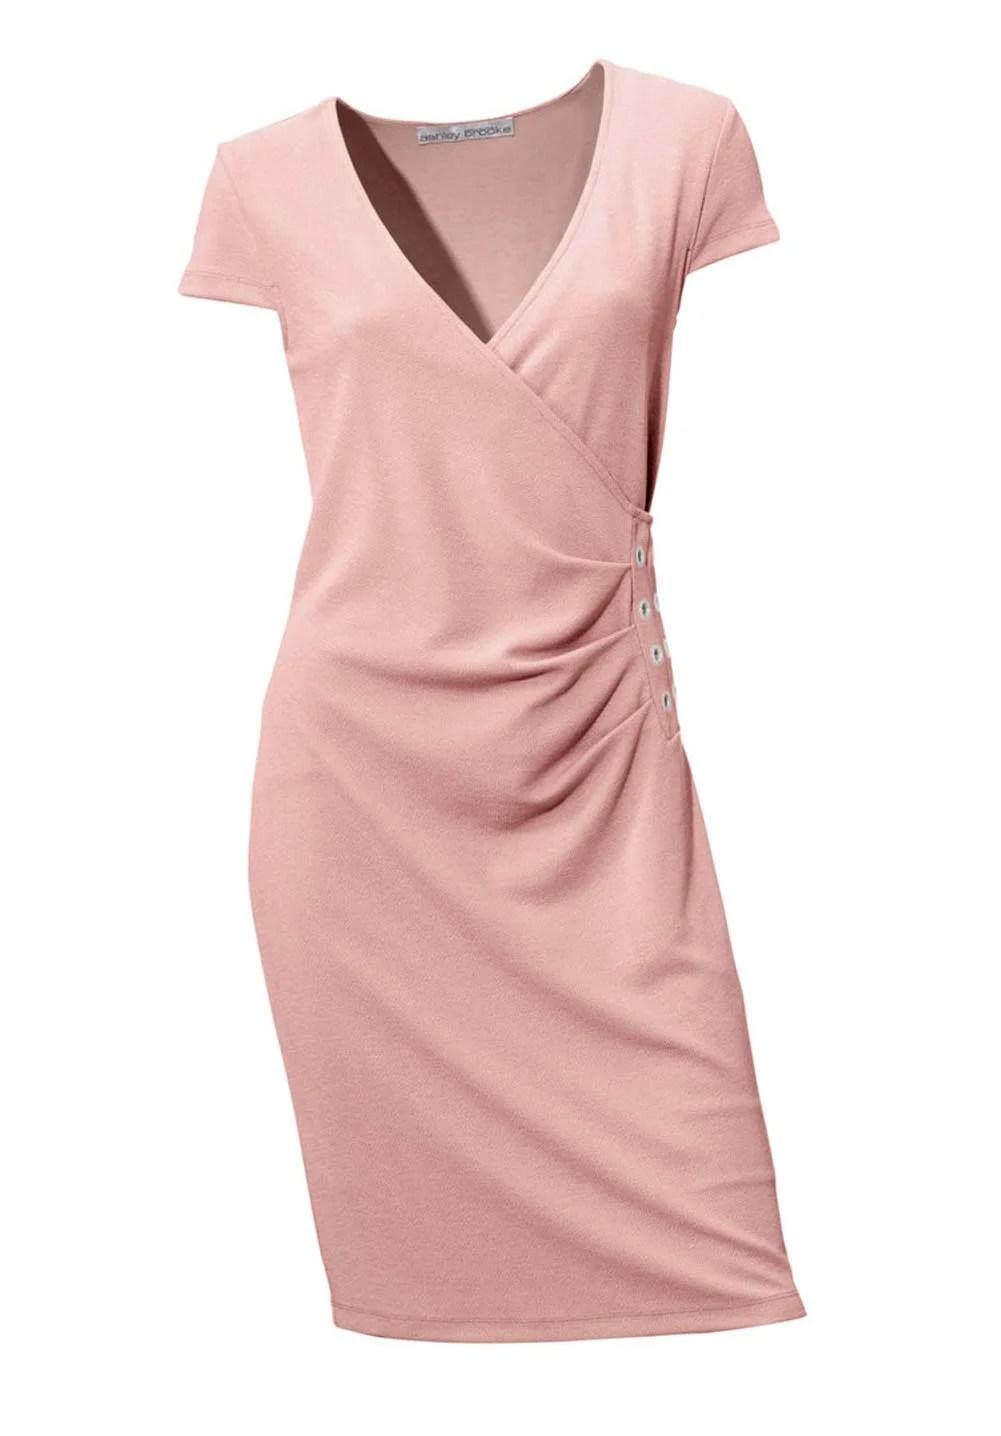 003.086 ASHLEY BROOKE Damen Designer-Bodyforming-Etuikleid Rose